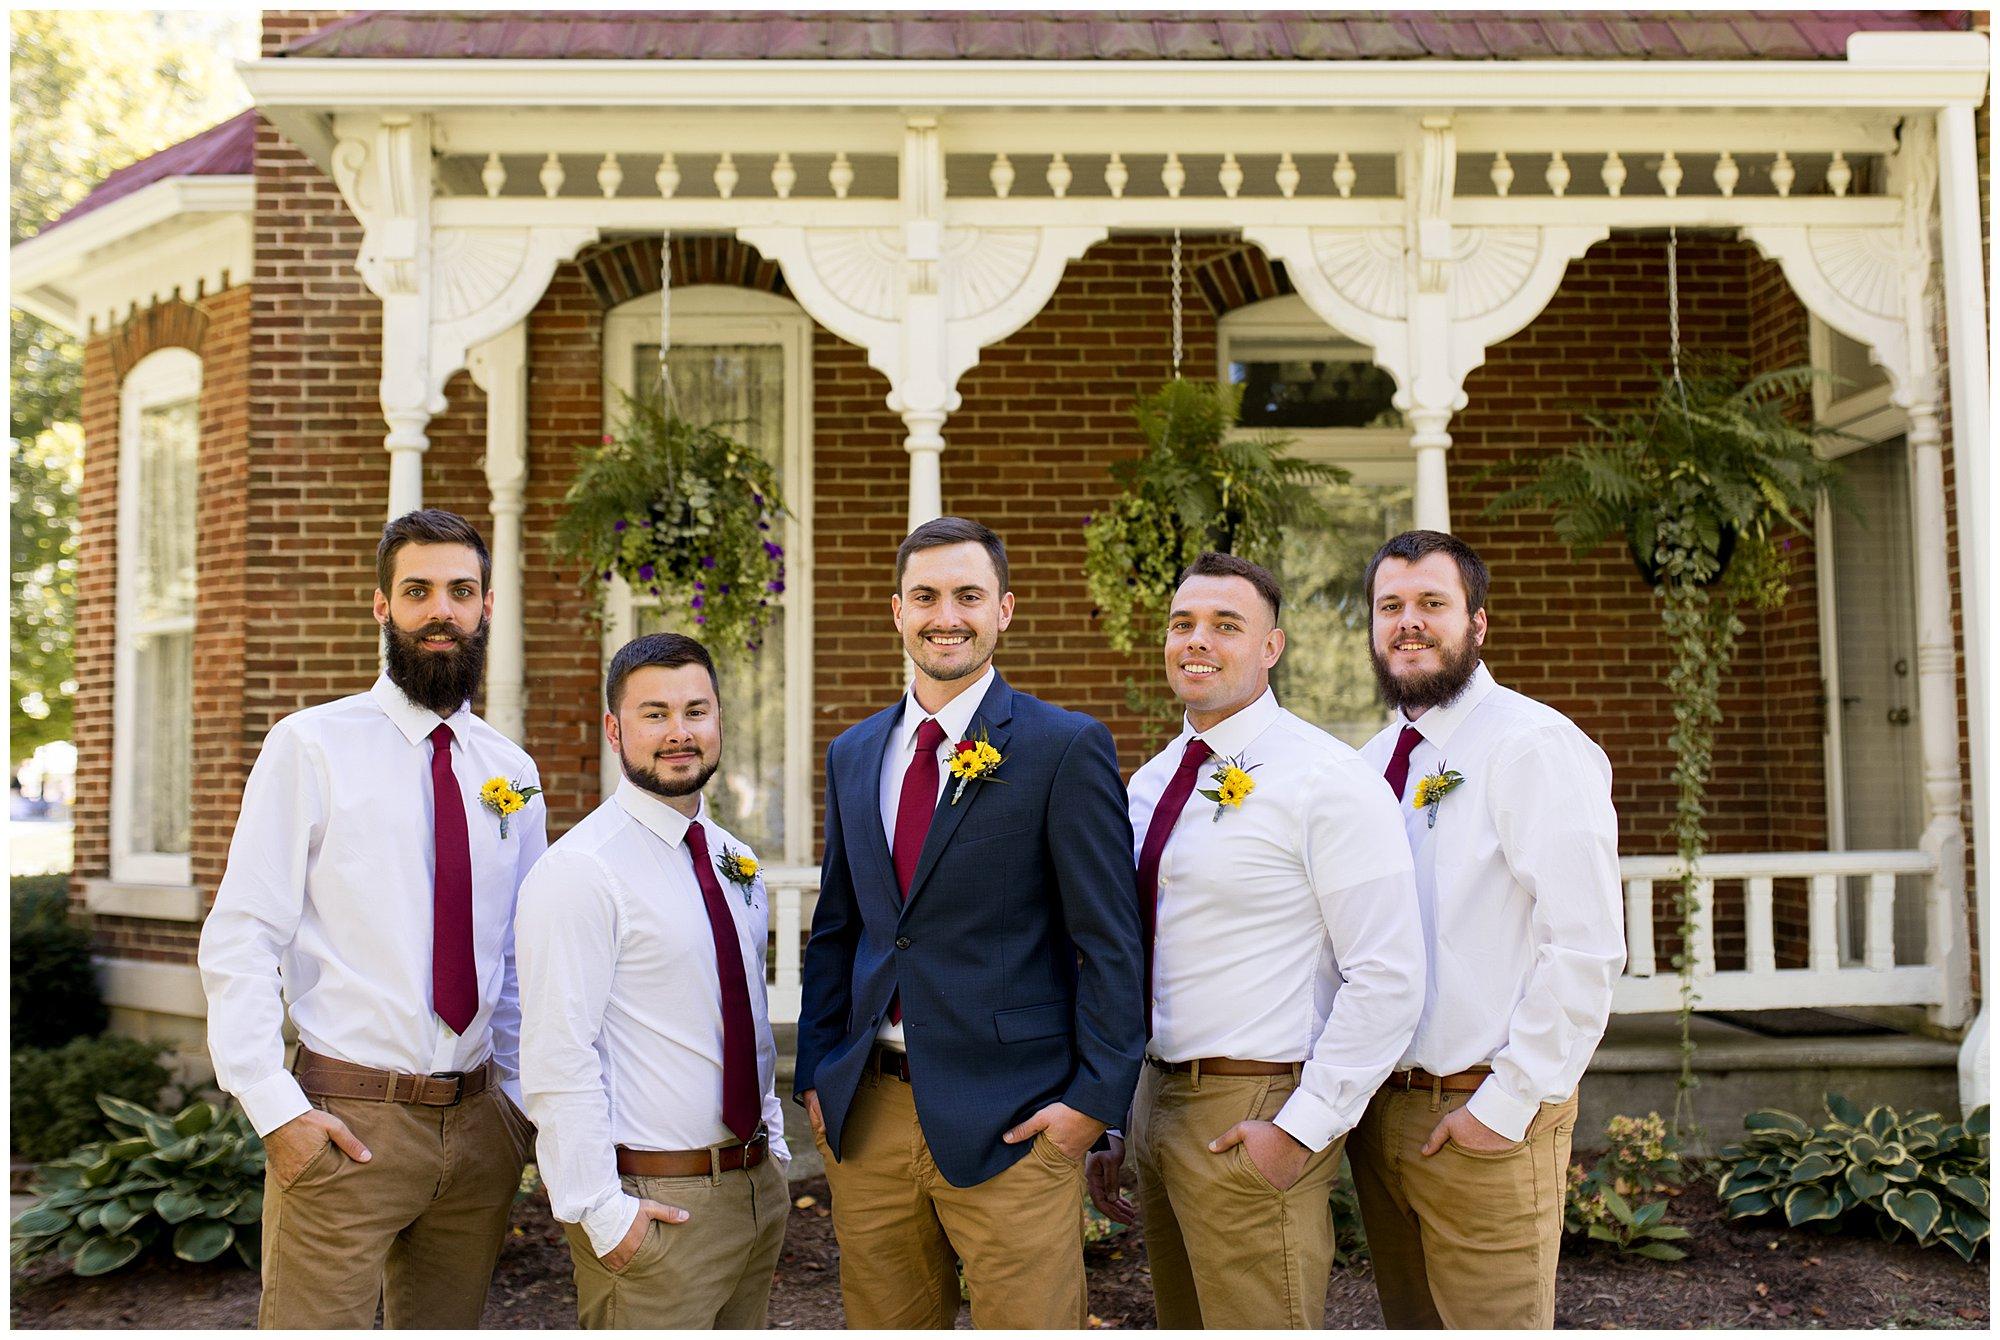 groom and groomsmen before wedding at Legacy Barn in Kokomo Indiana